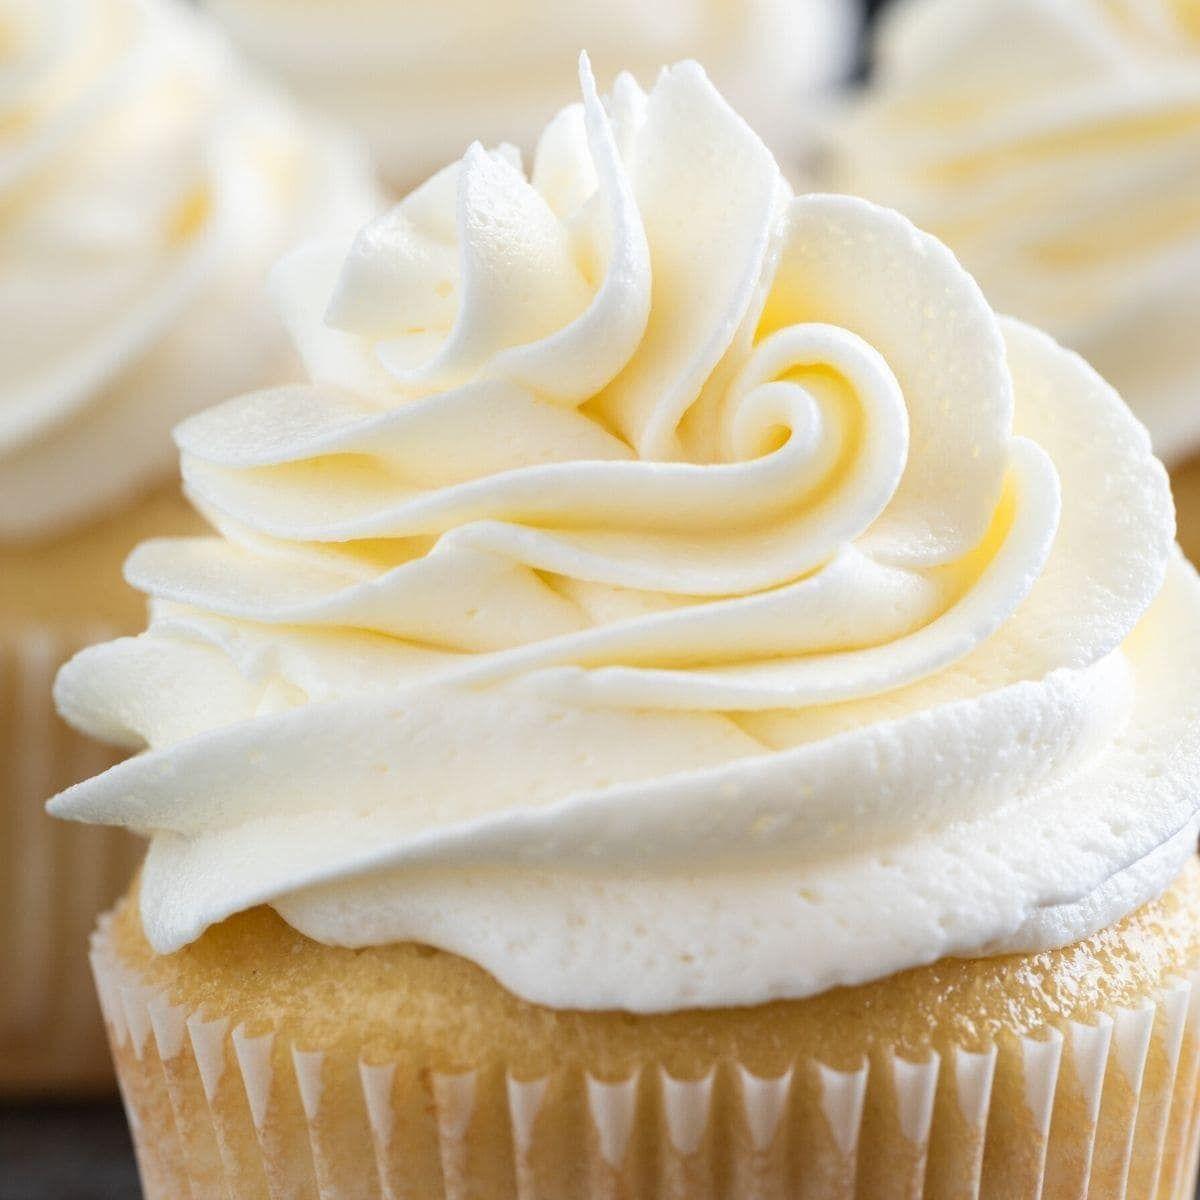 Vanilla Buttercream Frosting Recipe In 2020 Frosting Recipes Vanilla Buttercream Frosting Buttercream Icing Recipe